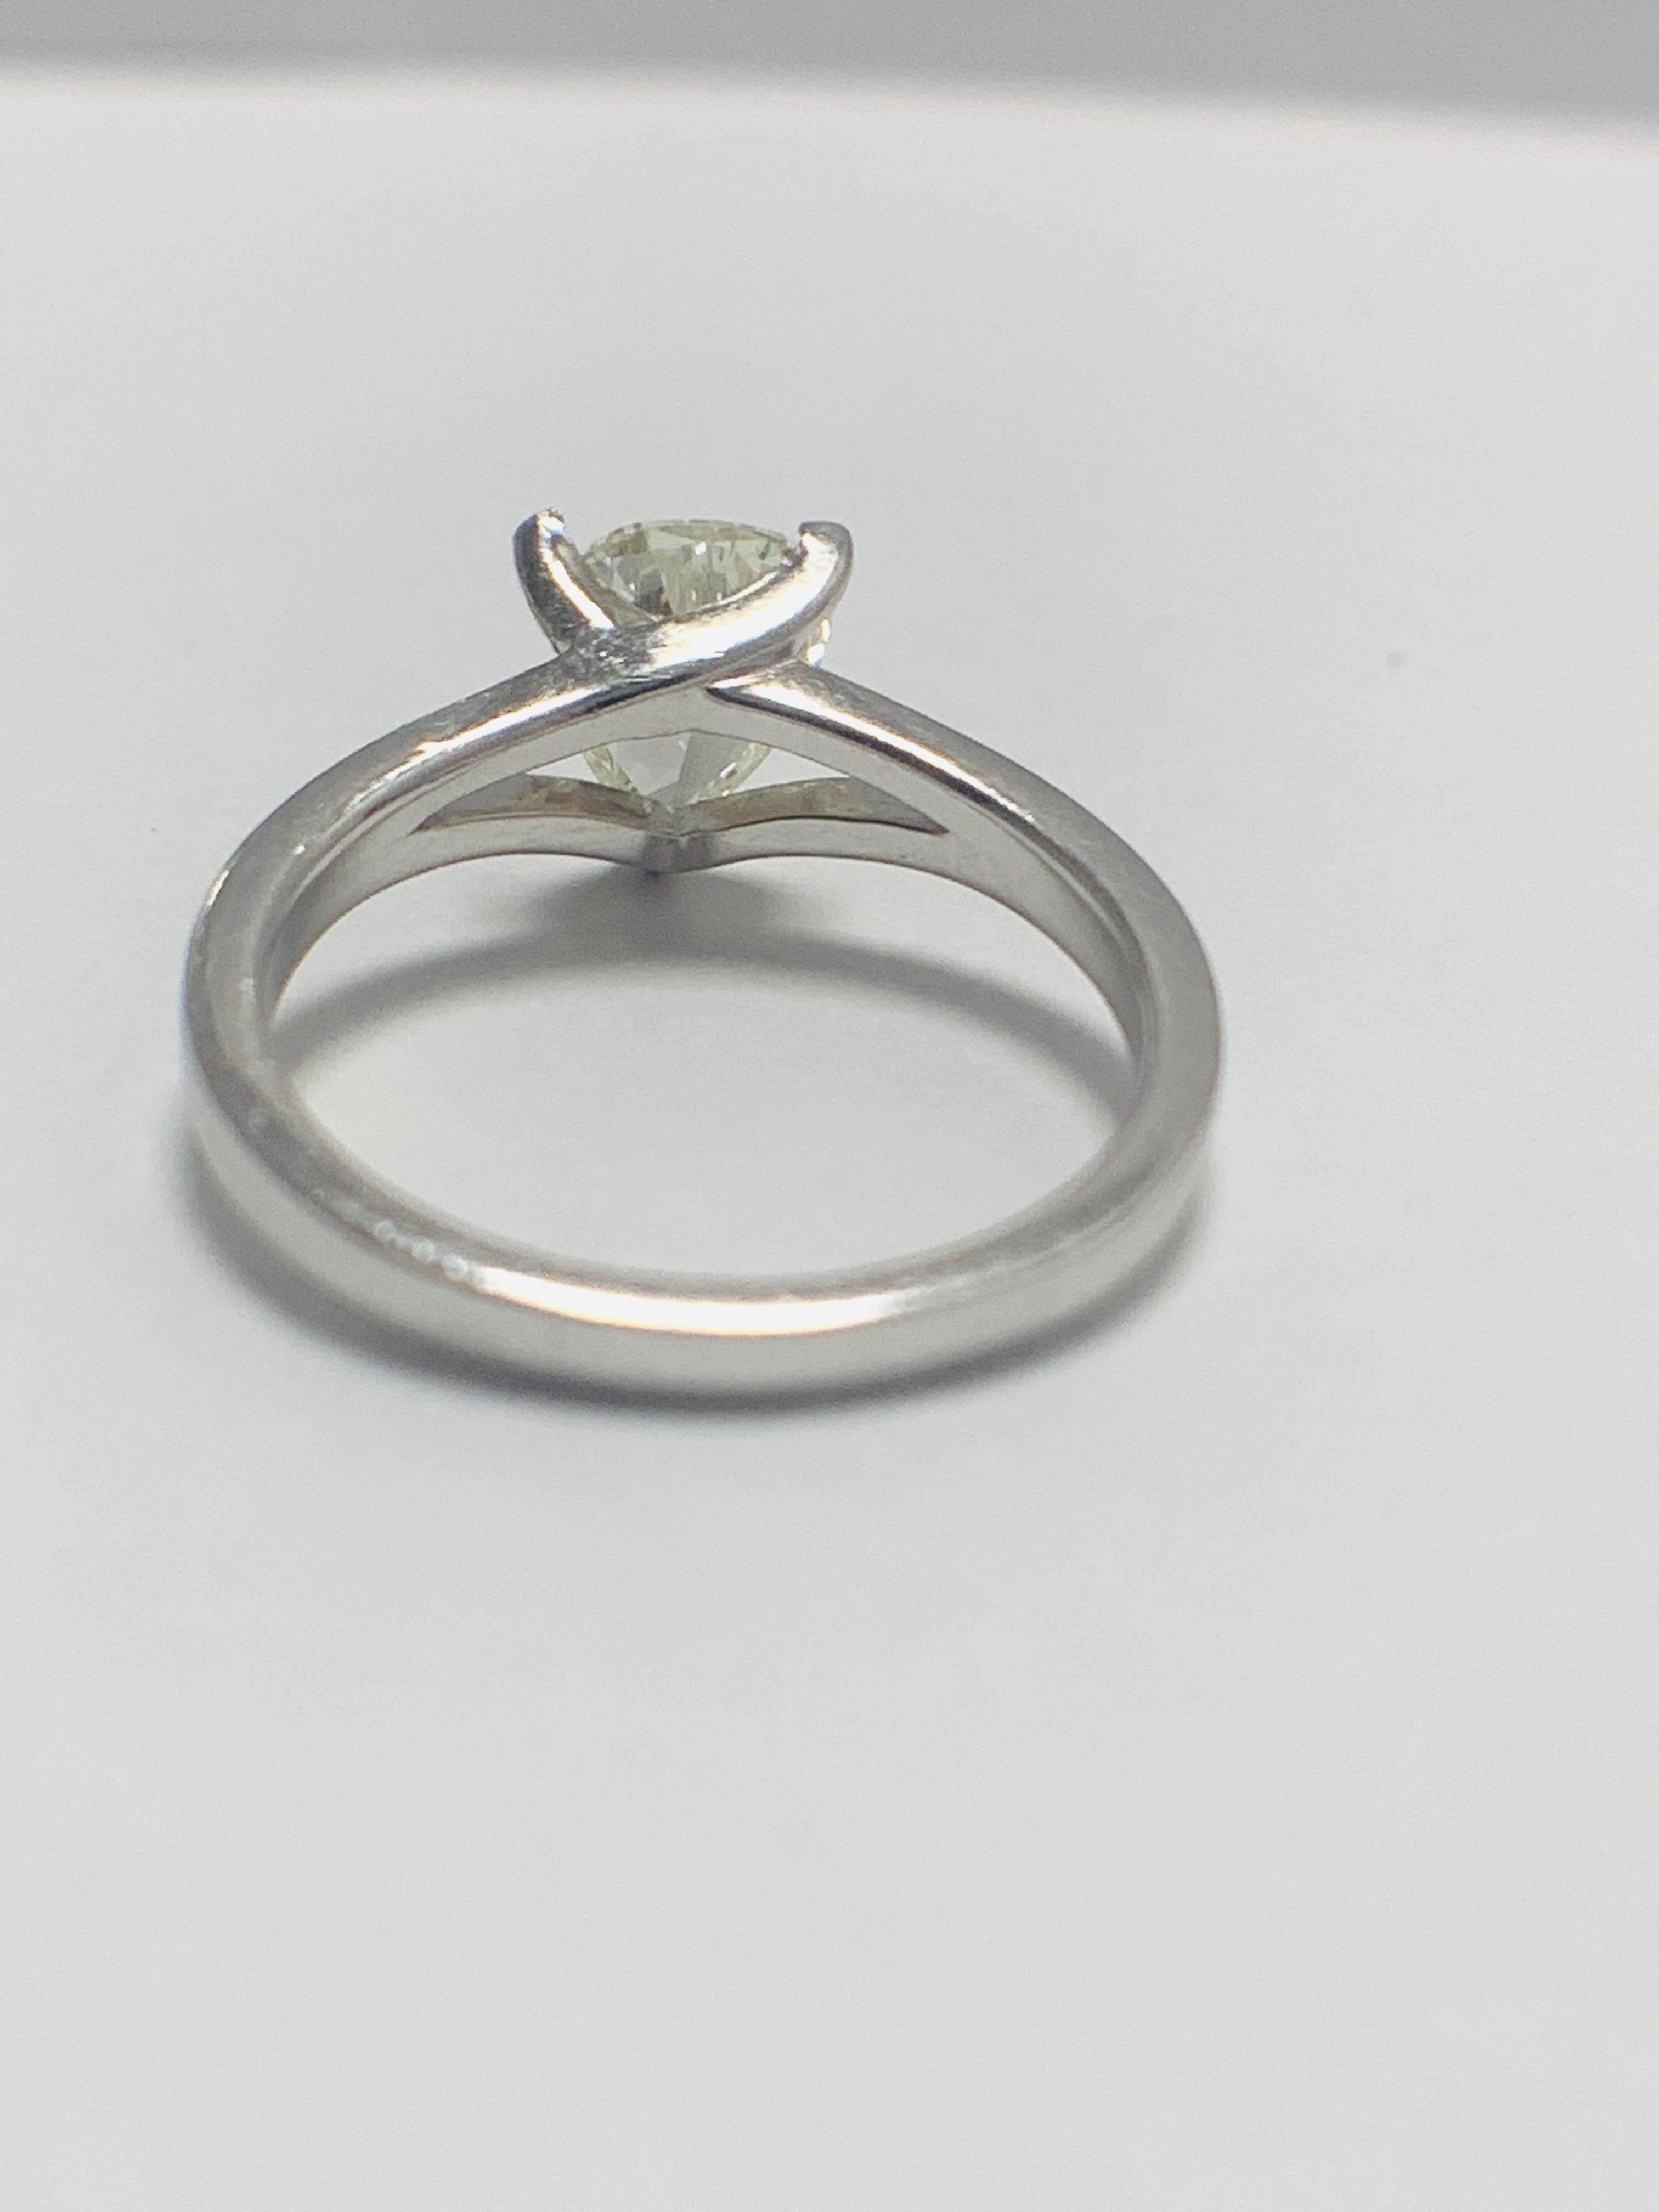 1ct Pearshape Diamond PLatinum Solitaire Ring. - Image 5 of 9